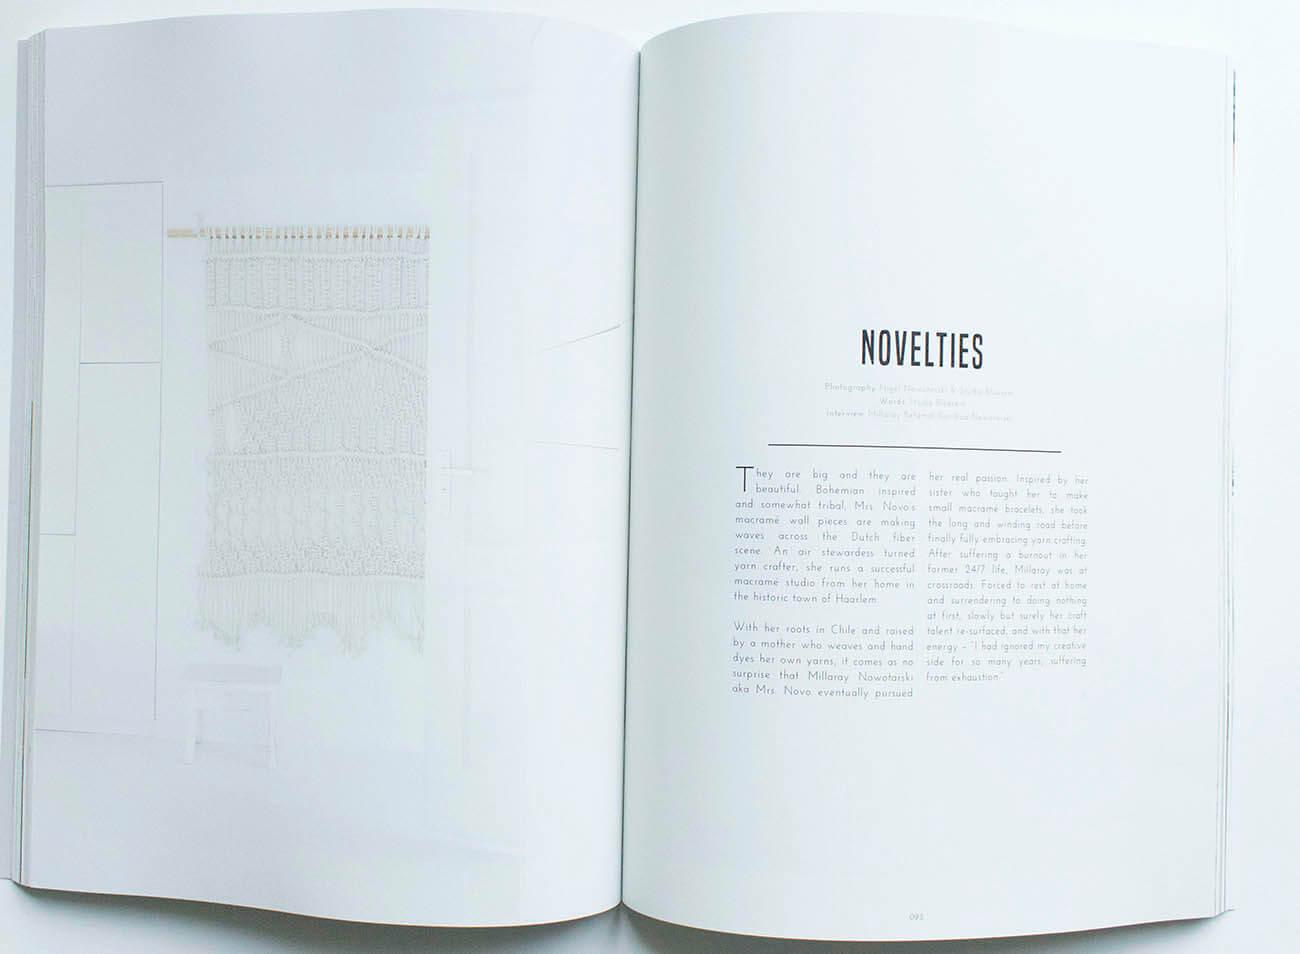 Art Novelties in magazine Goud Gold Milla Novo Macrame Wallhanging